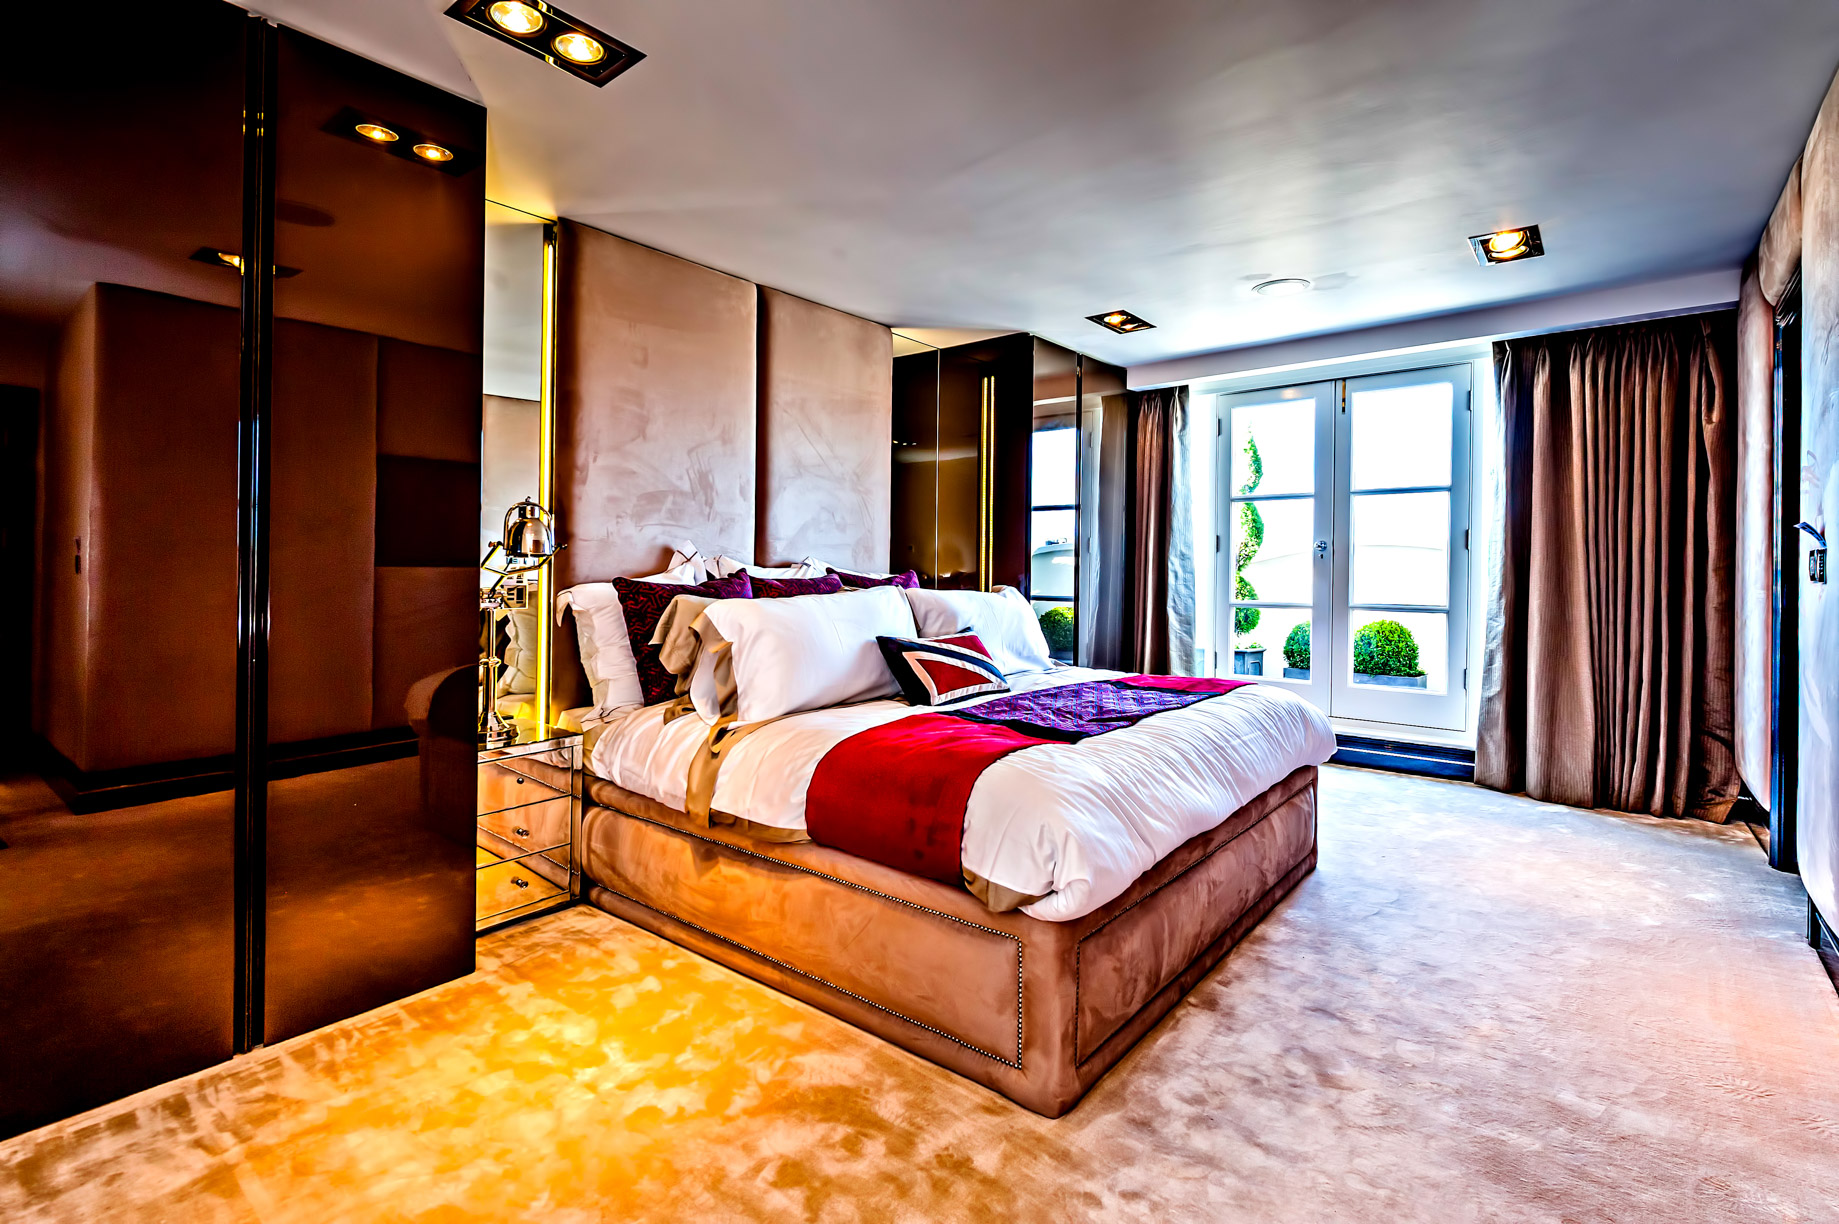 Flat 5 Apartment - 34 Holland Park, London, England, UK